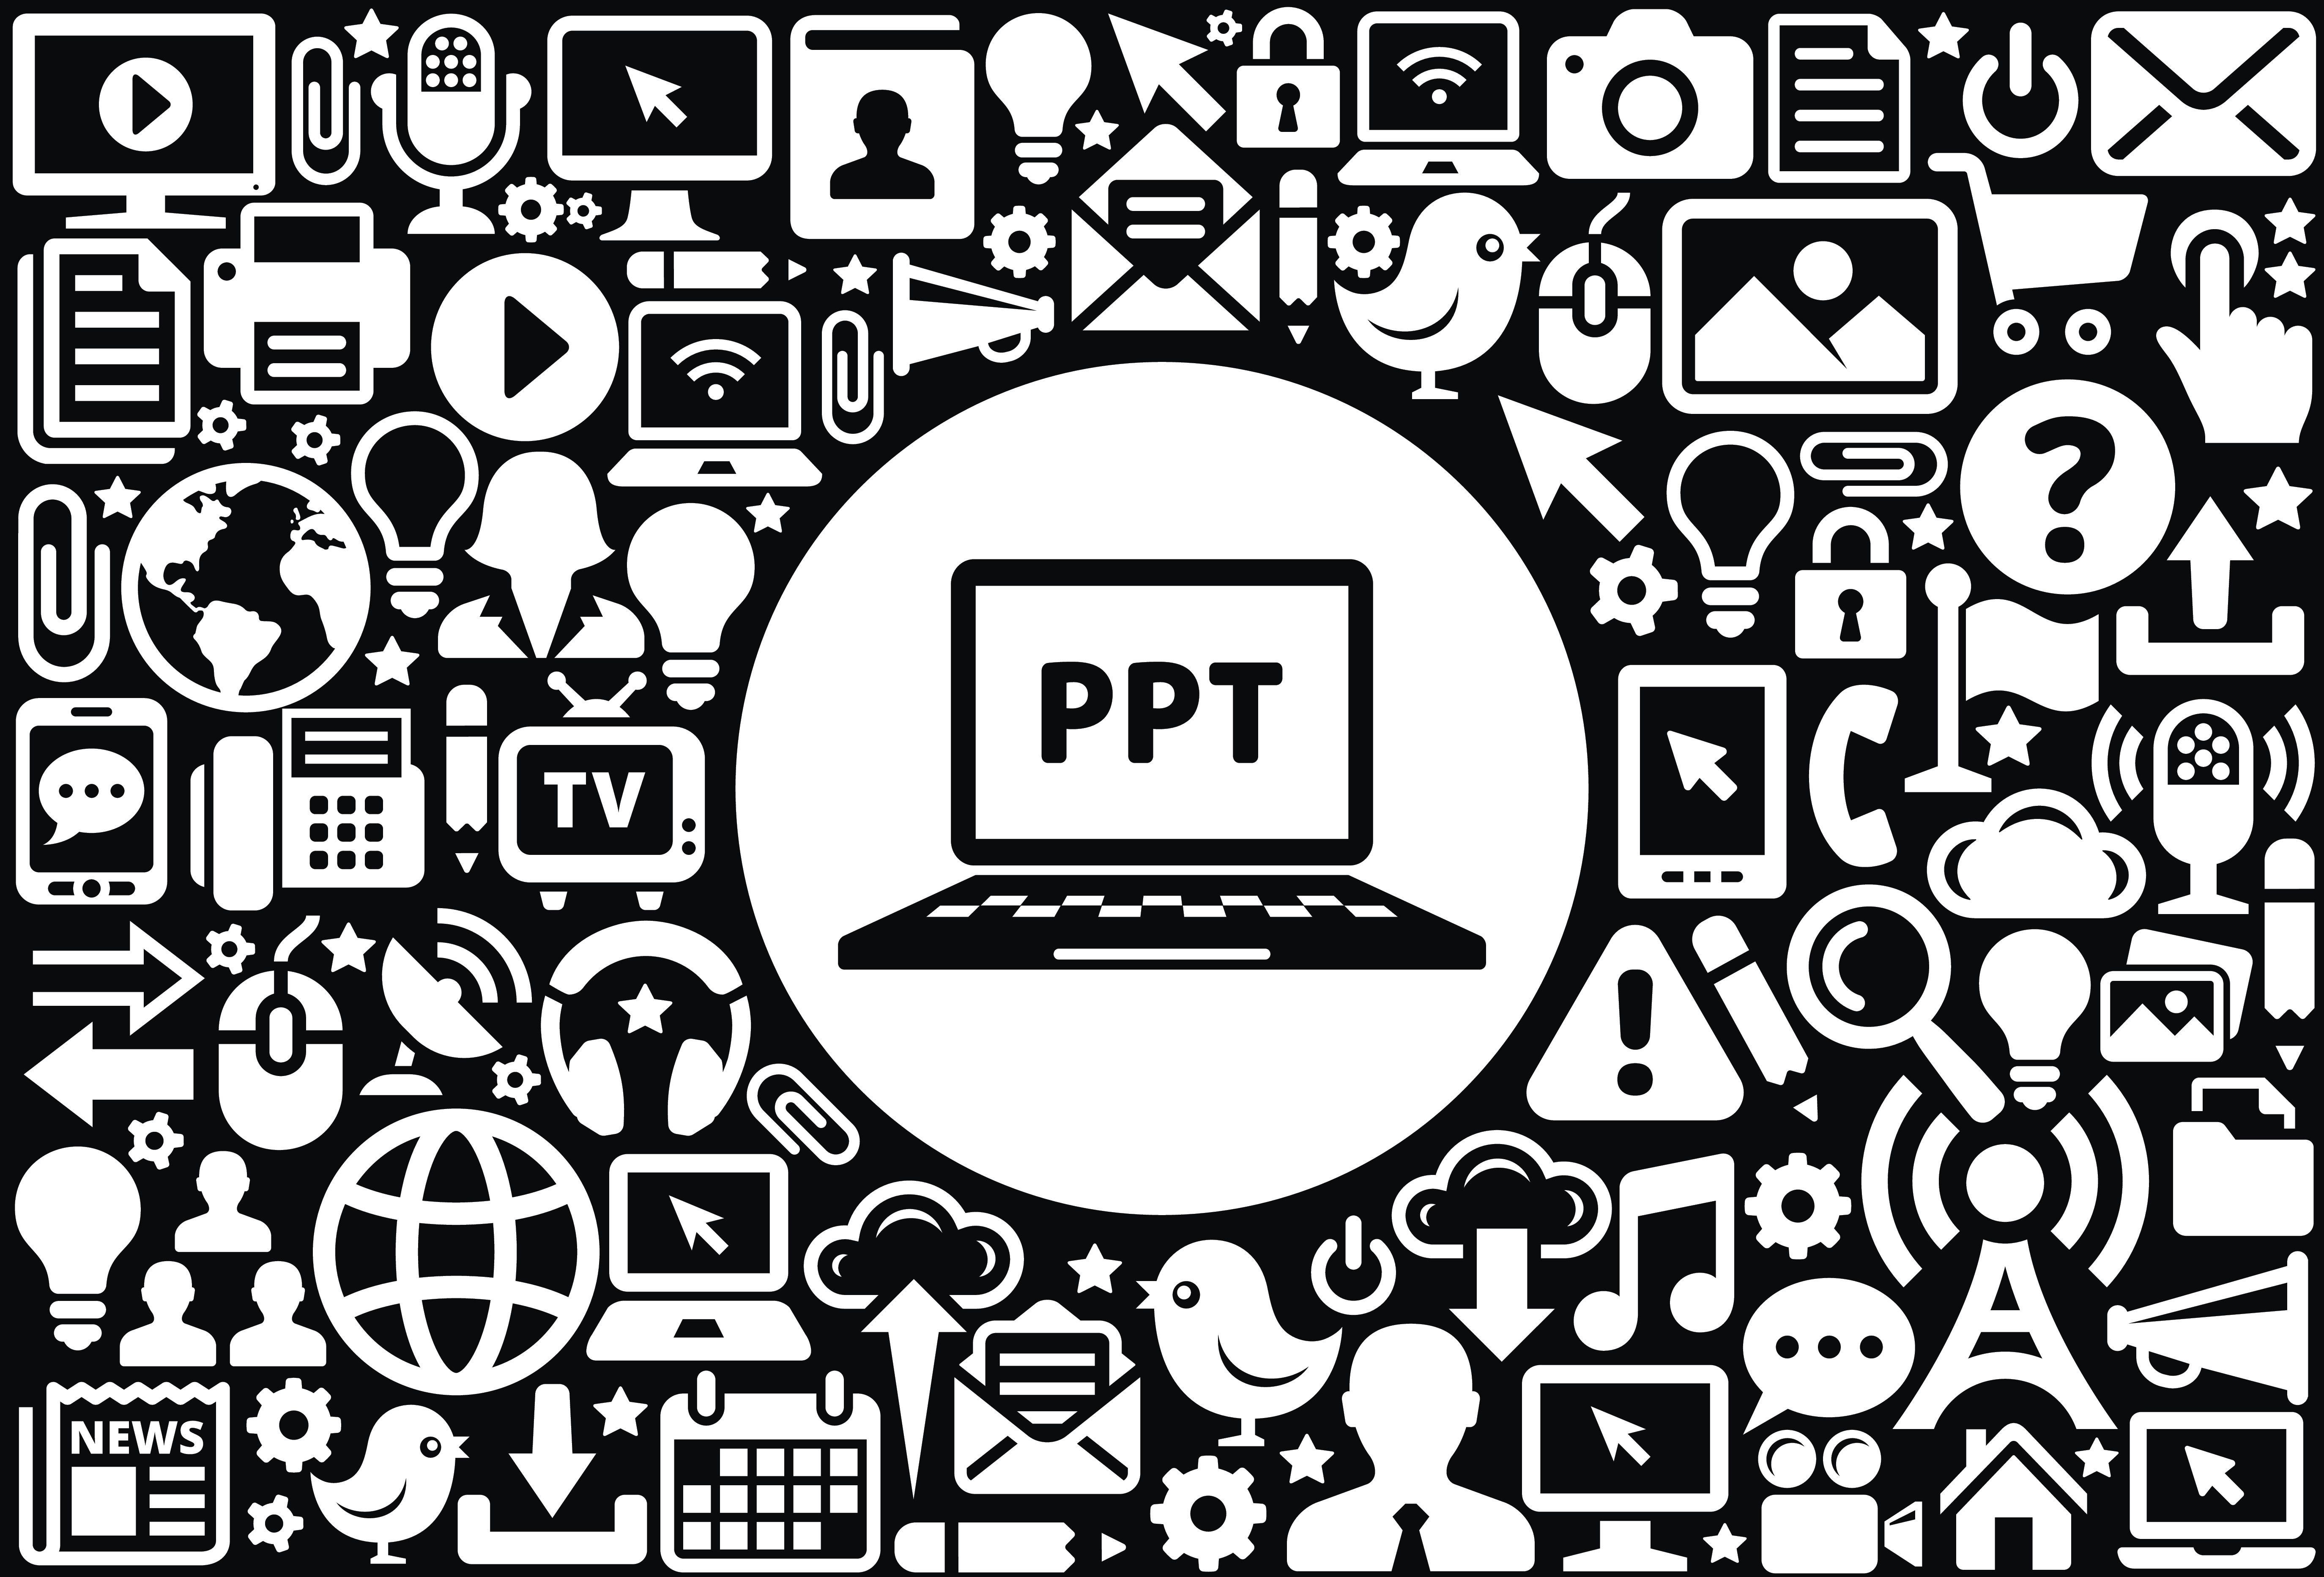 Classroom Tech: PowerPoint Multimedia Lesson Plans